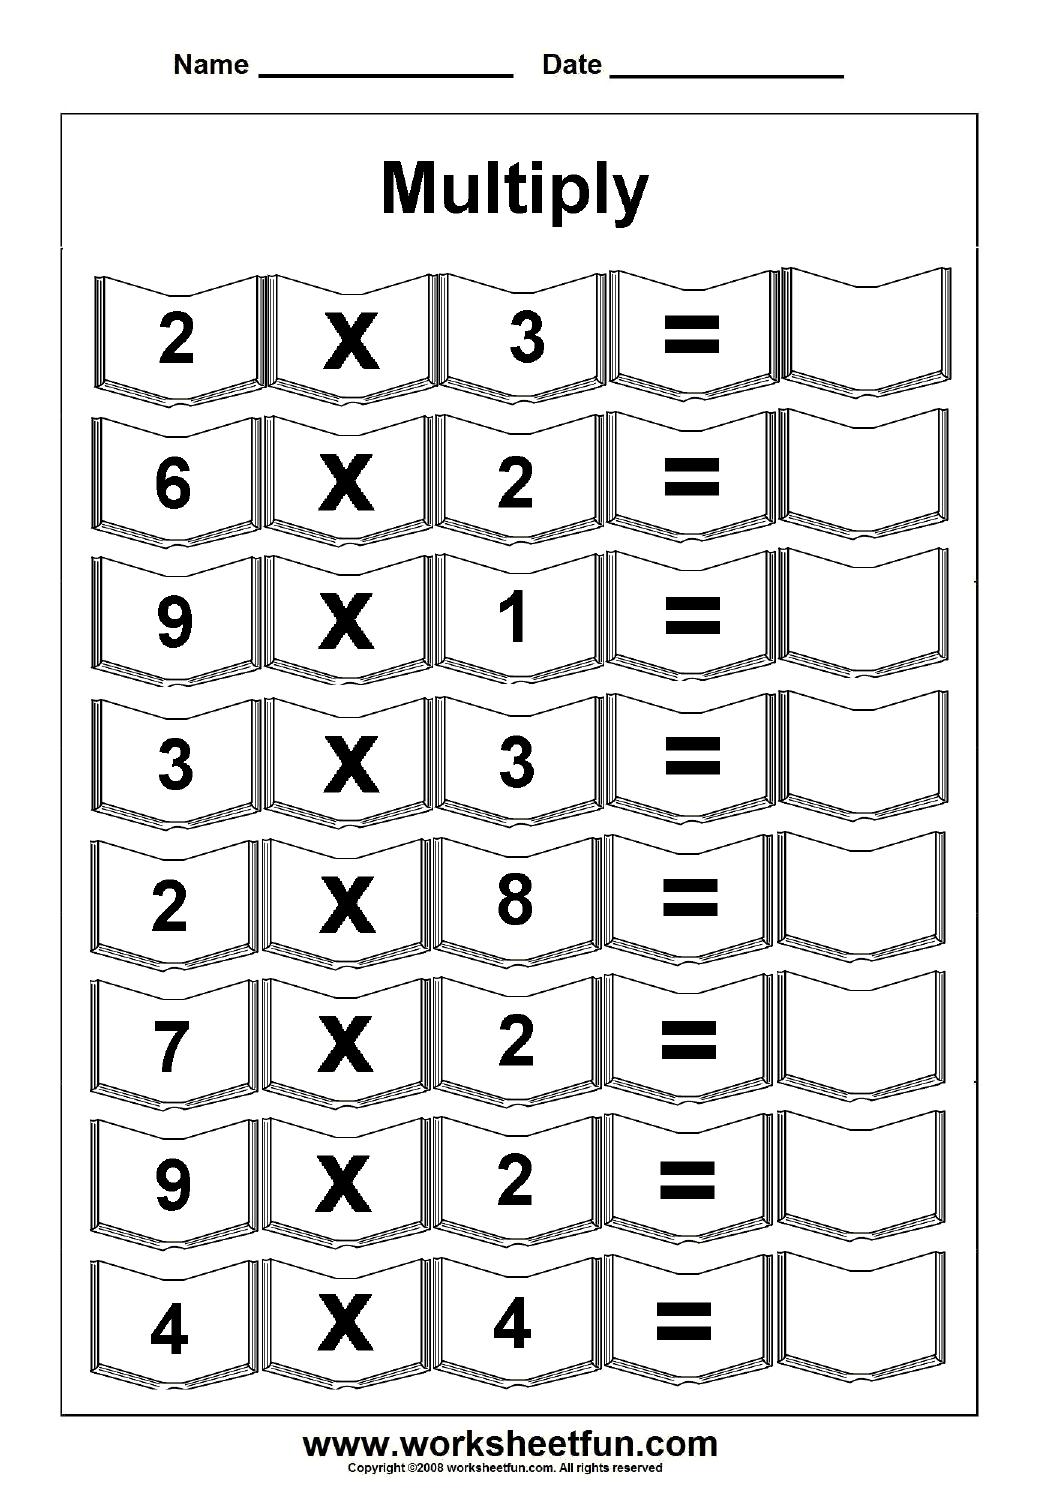 Math Worksheet : Multiplication Worksheets Free Printable